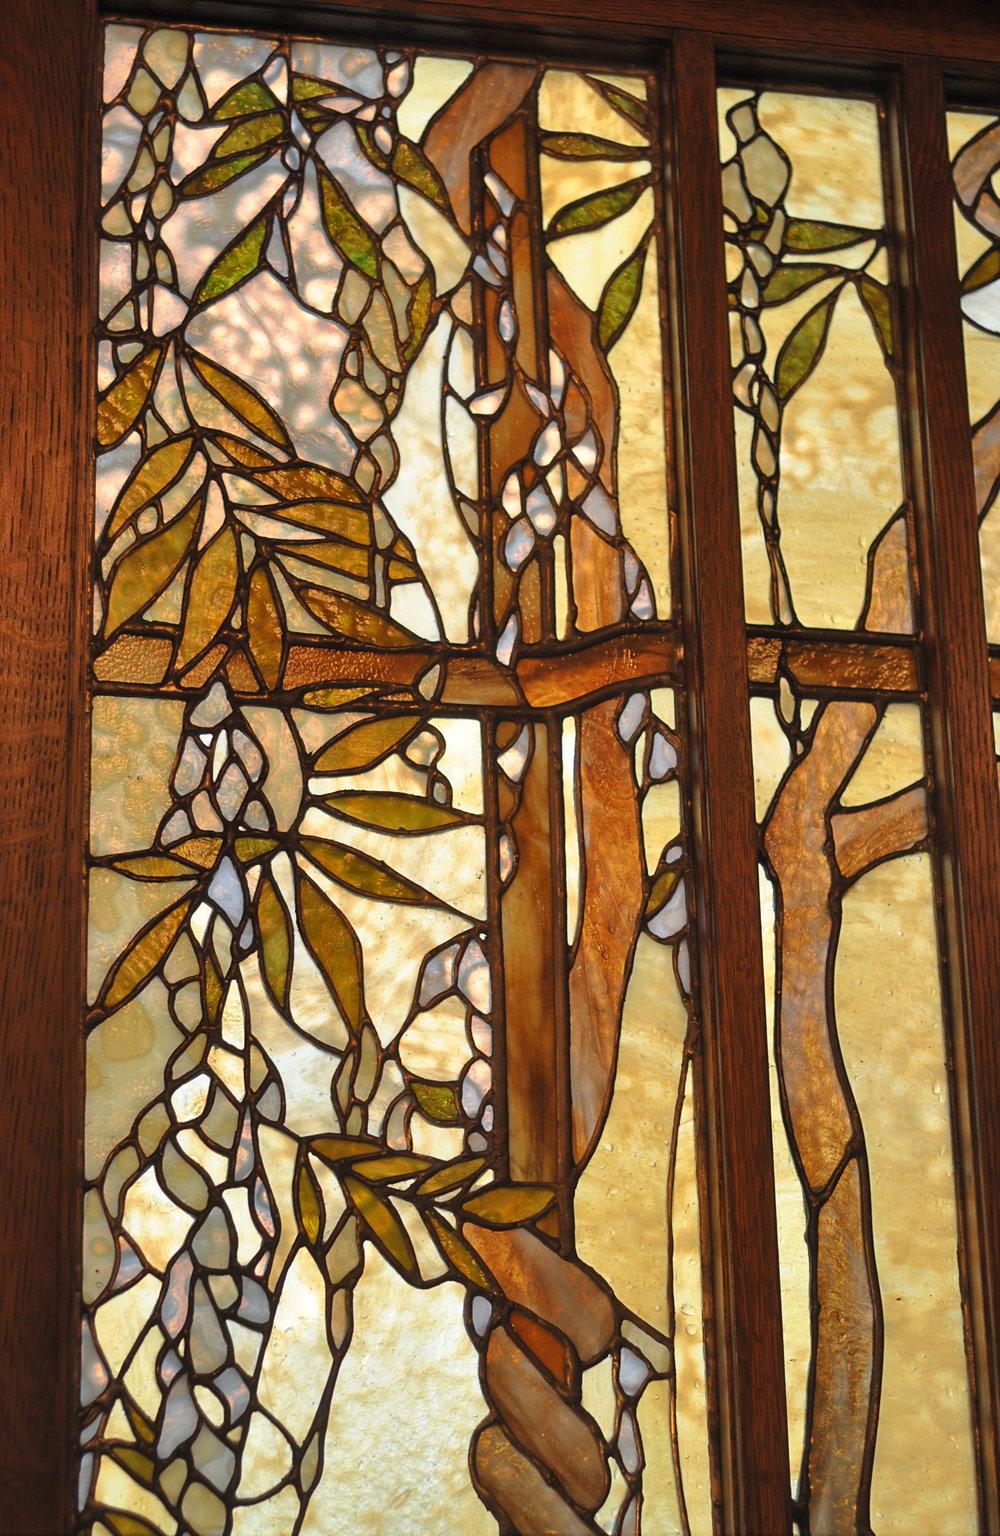 wisteria_detail2.jpg